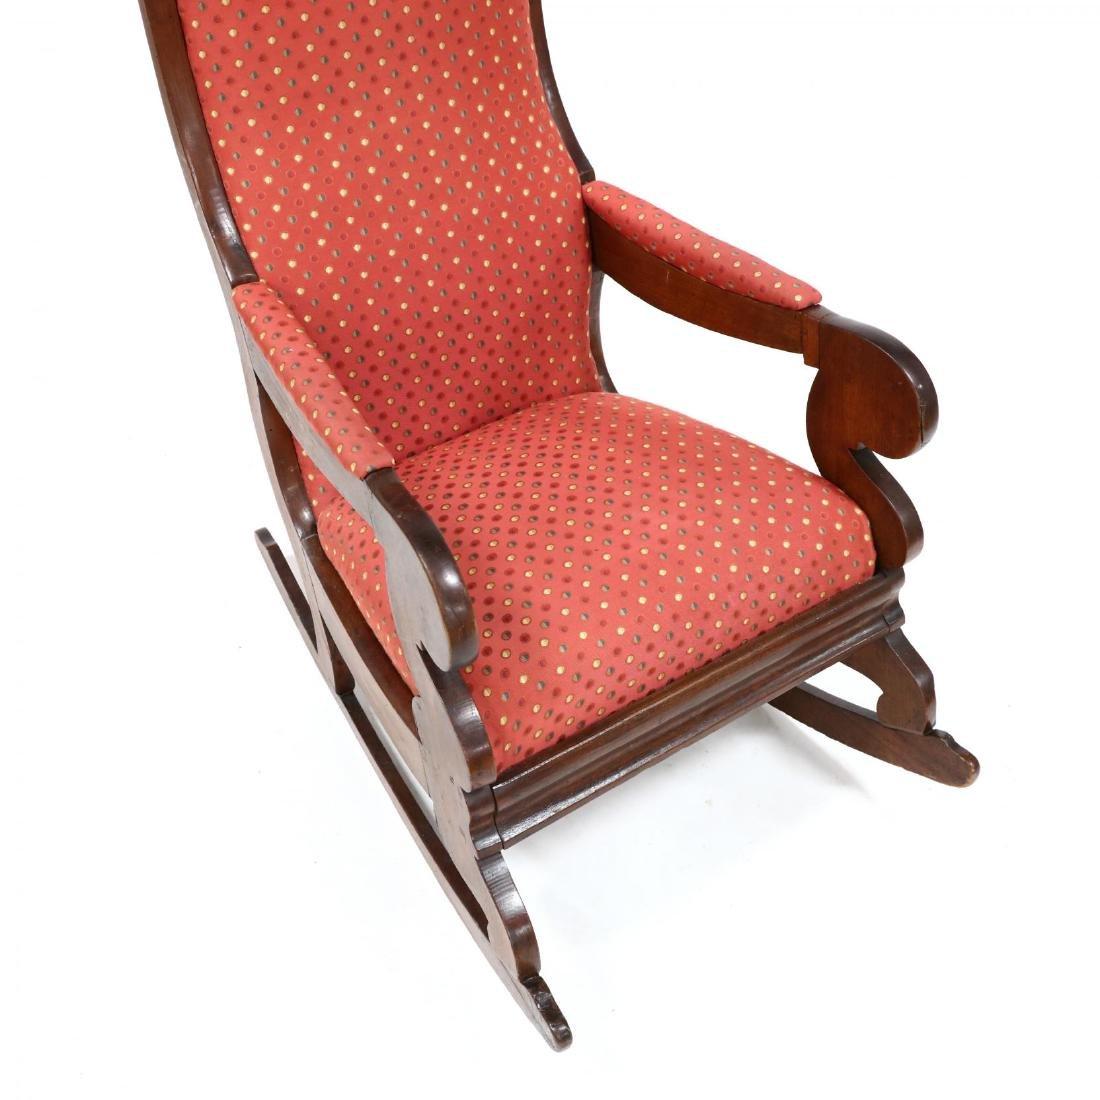 att. Thomas Day, American Classical Rocking Chair - 2